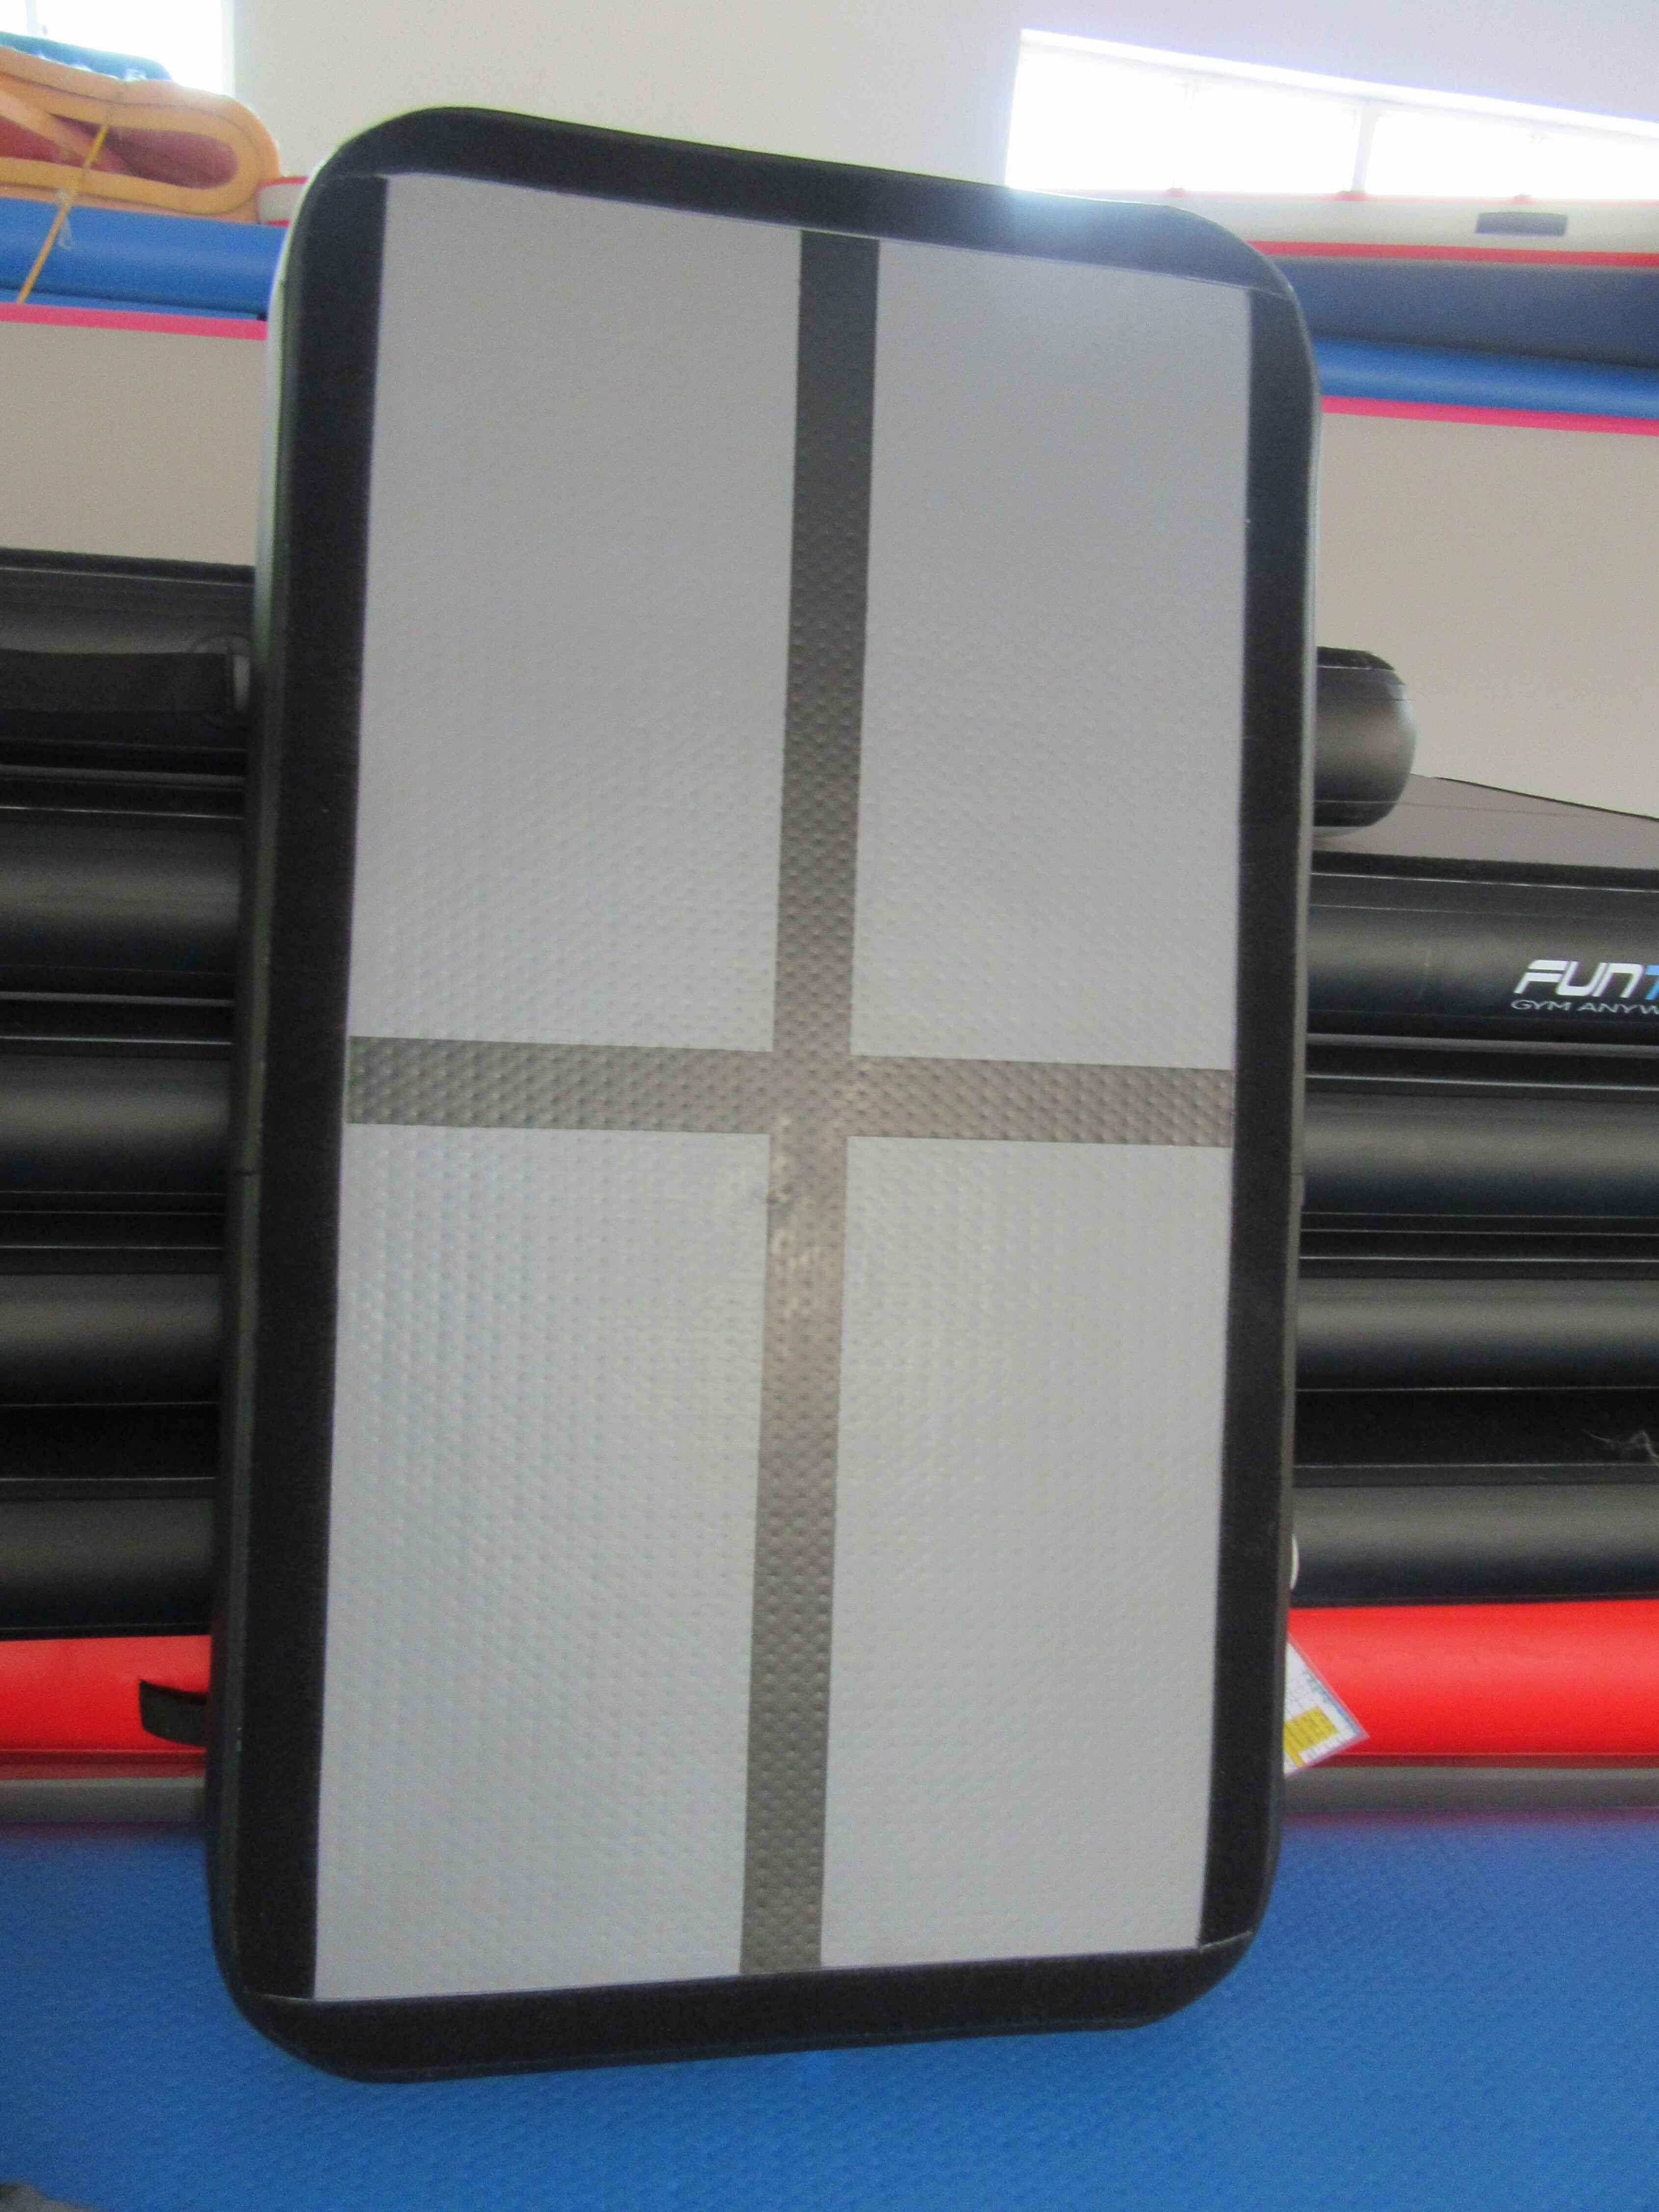 b mats gymnastic gymnastics flooring tumbling diy sports outdoors amazon x exercise com tenive leather pu mat